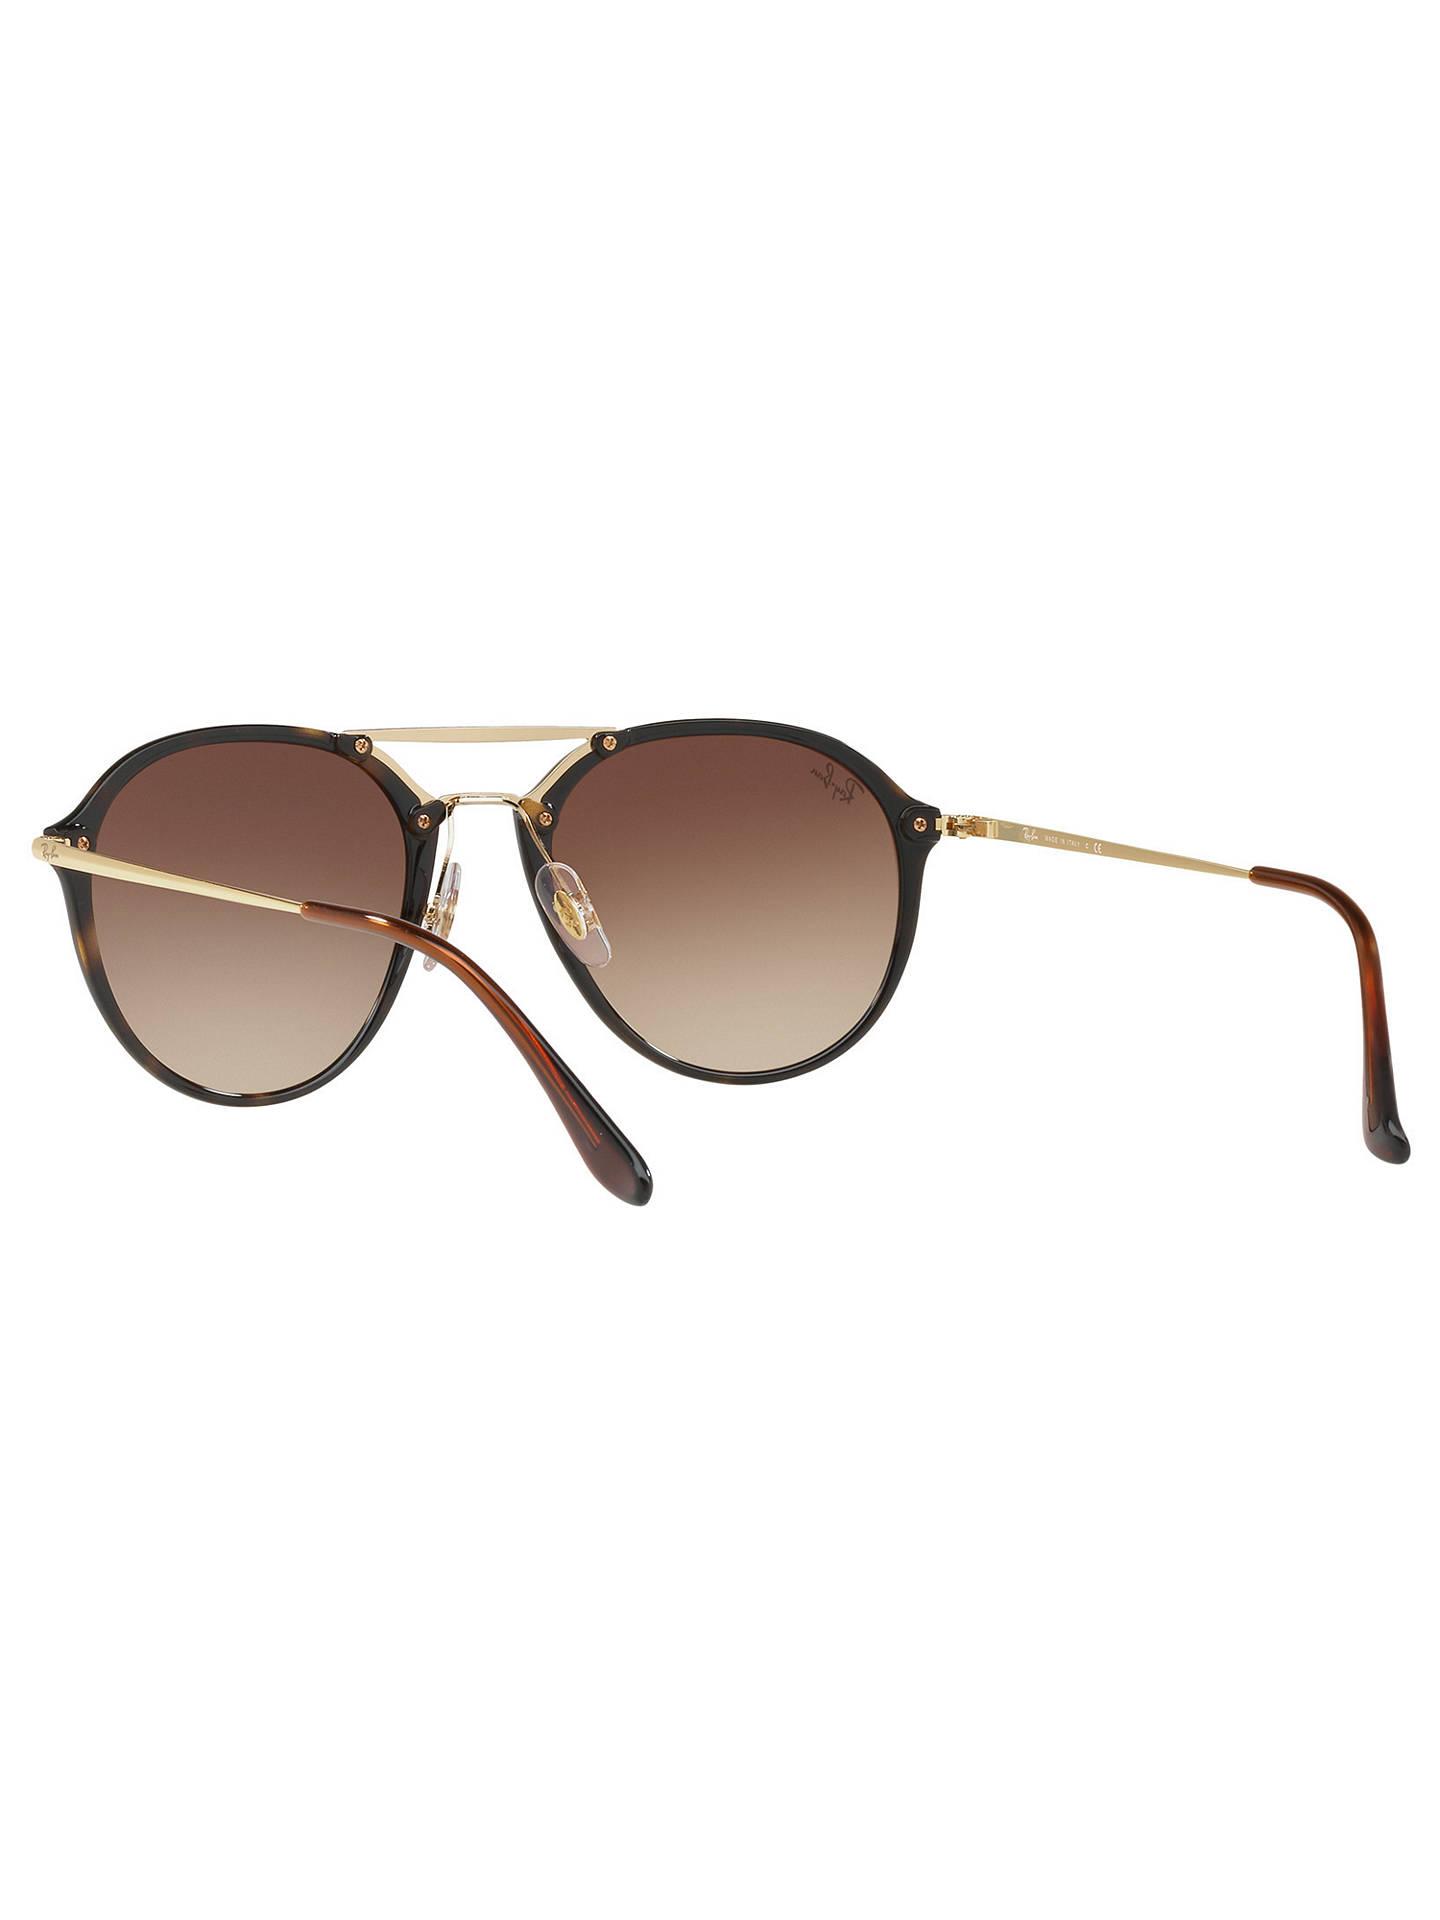 f75d795552 ... BuyRay-Ban RB4292 Oval Blaze Sunglasses